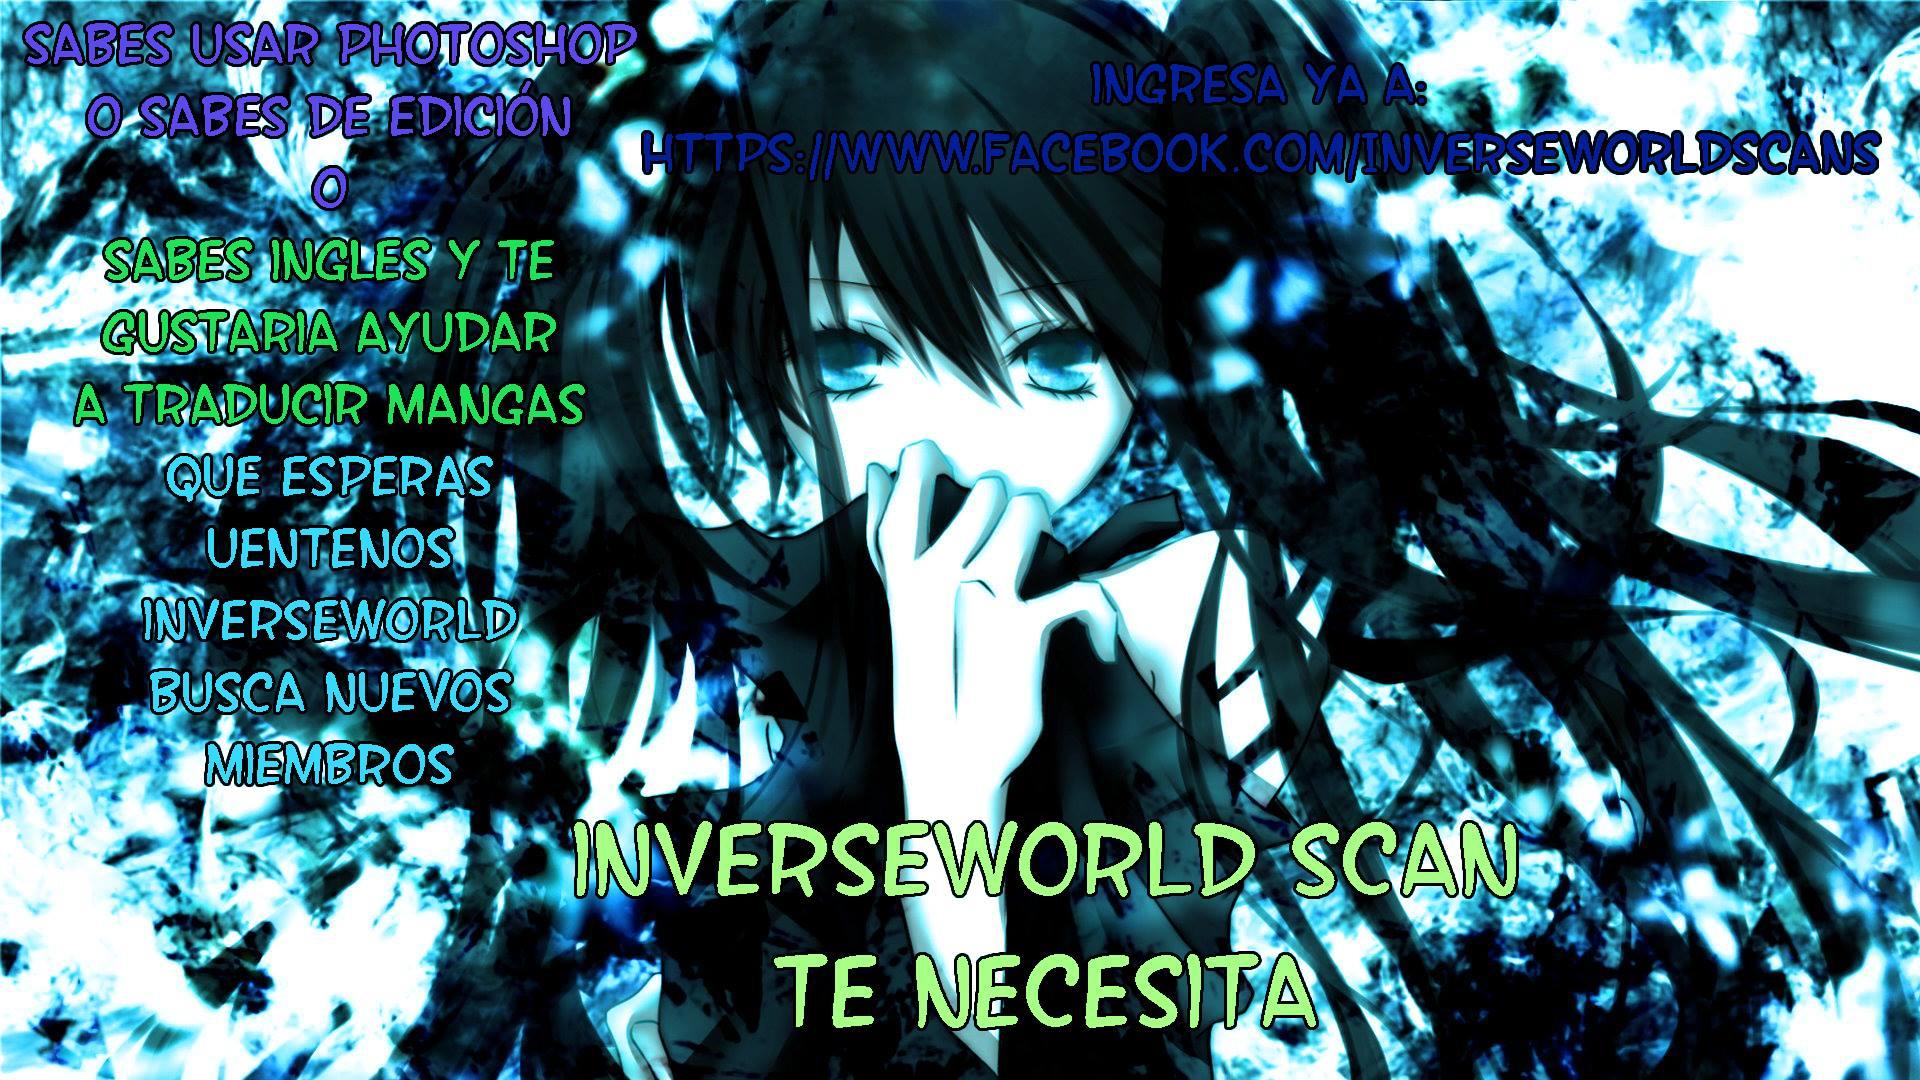 https://c5.mangatag.com/es_manga/10/14602/396566/f5bf0ba0a17ef18f9607774722f5698c.jpg Page 1